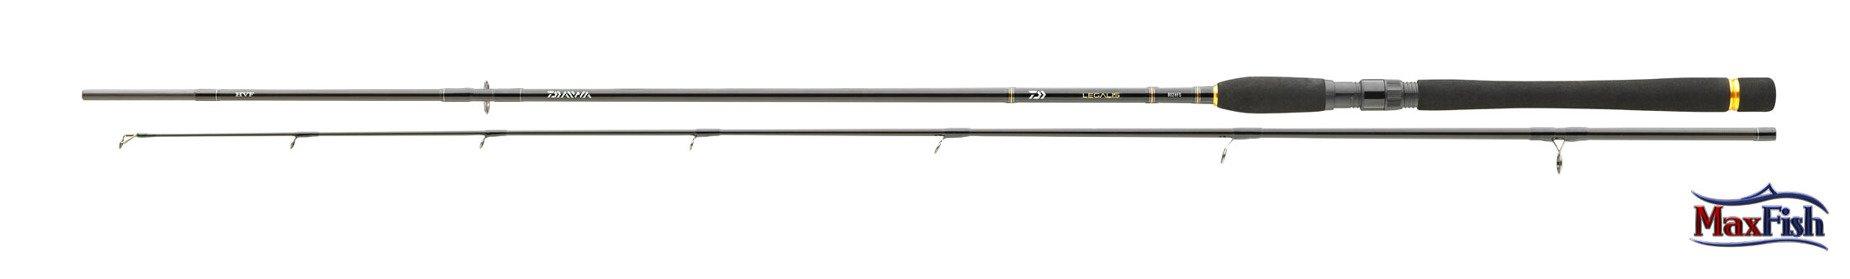 Daiwa Legalis Spin  240cm 50-100g